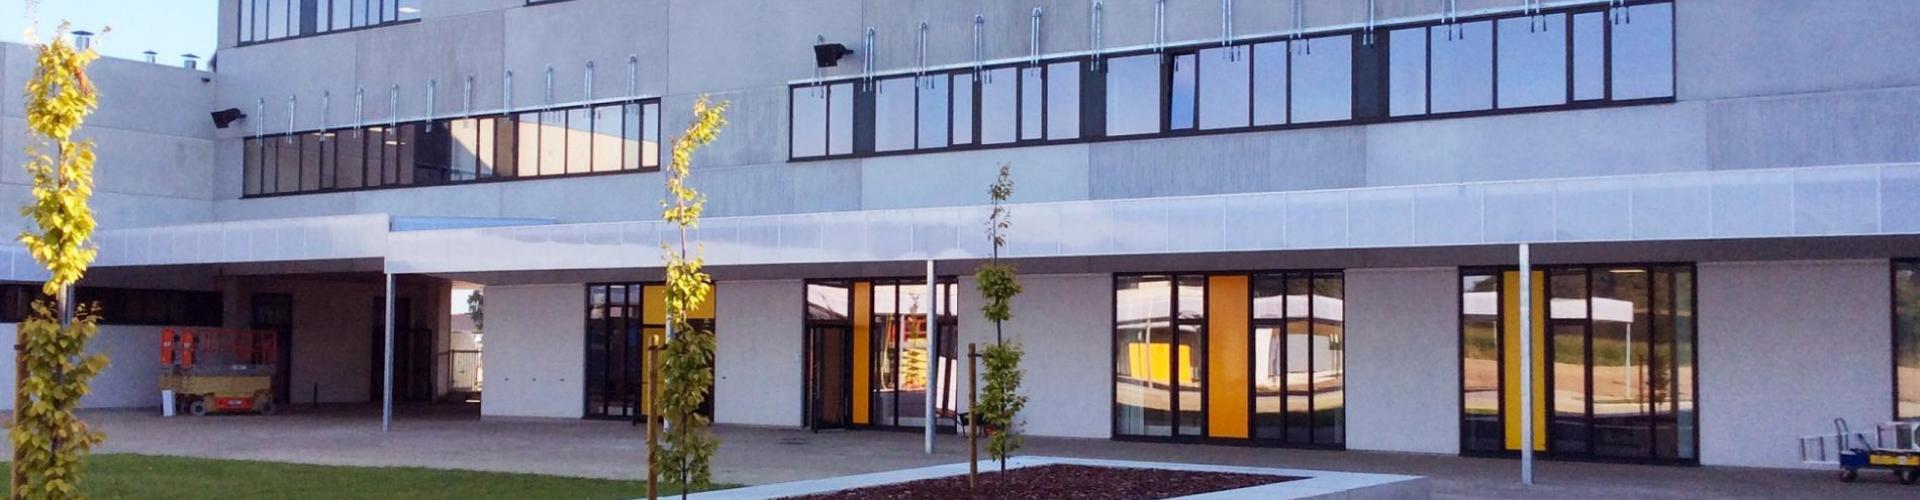 Technisch Instituut Sint-Michiel Bree